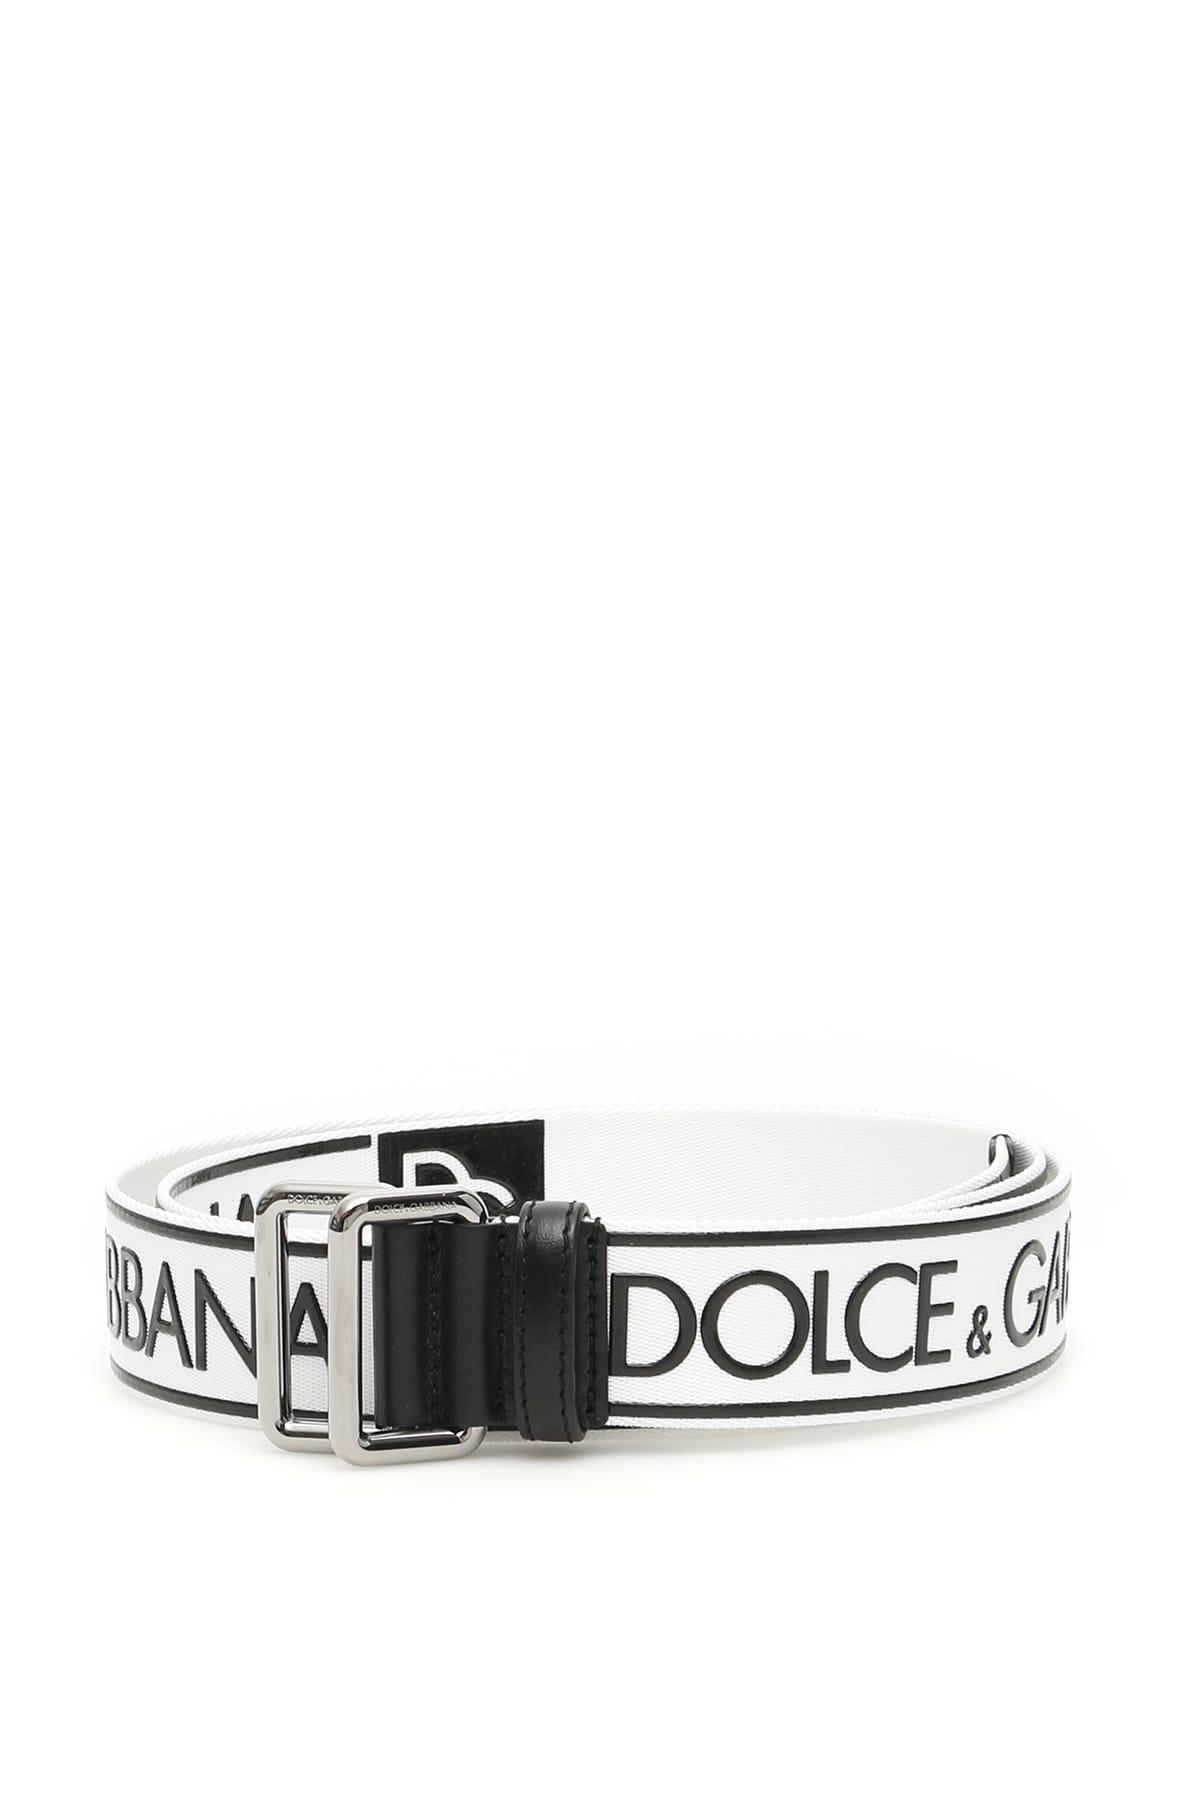 Dolce & Gabbana Belts LOGO BELT